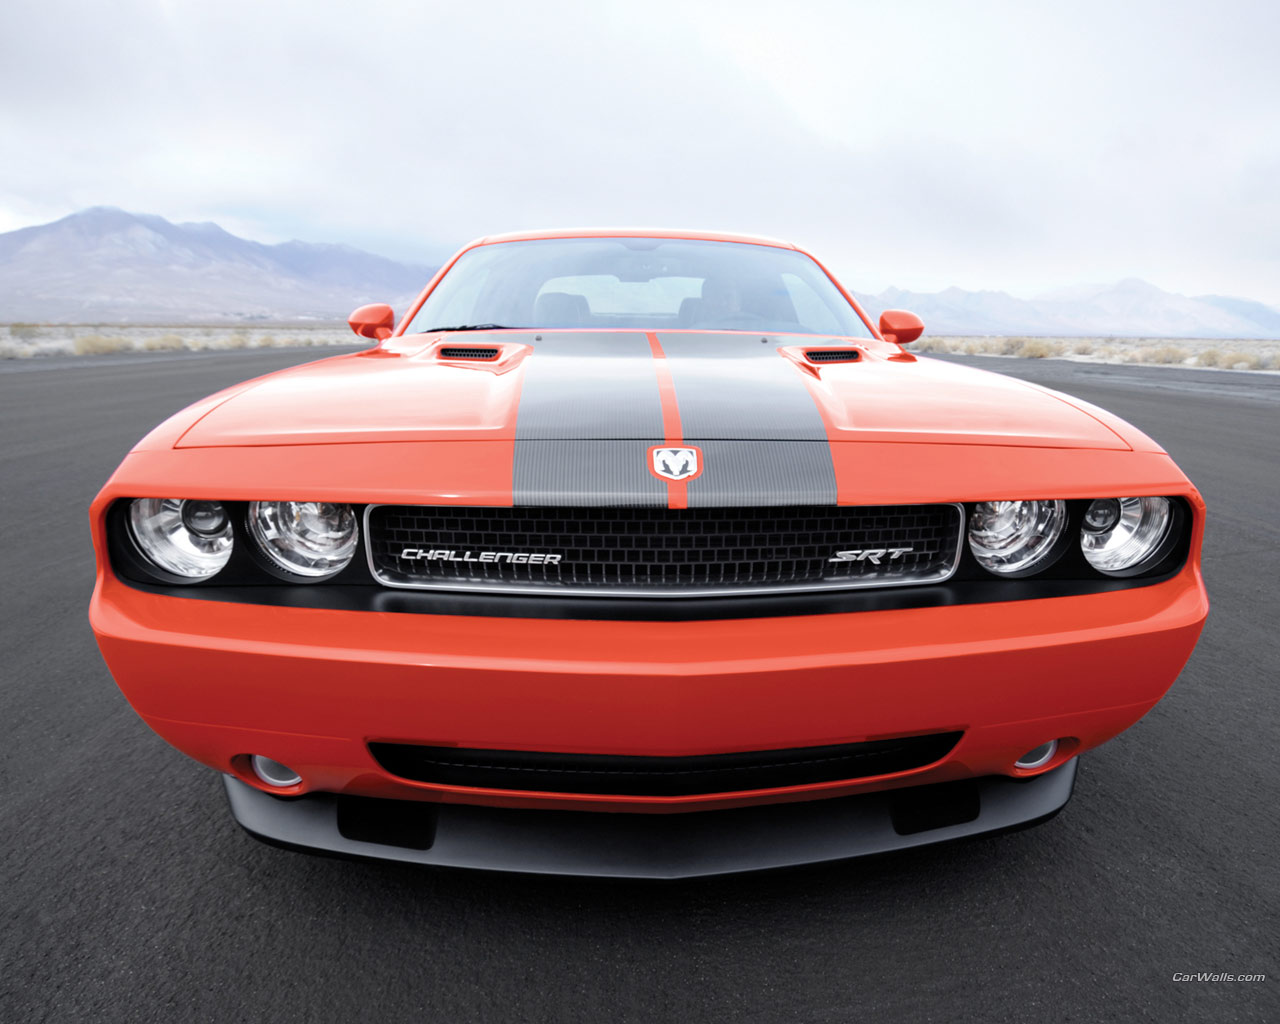 Dodge Challenger SRT8 1280 x 1024 wallpaper 1280x1024